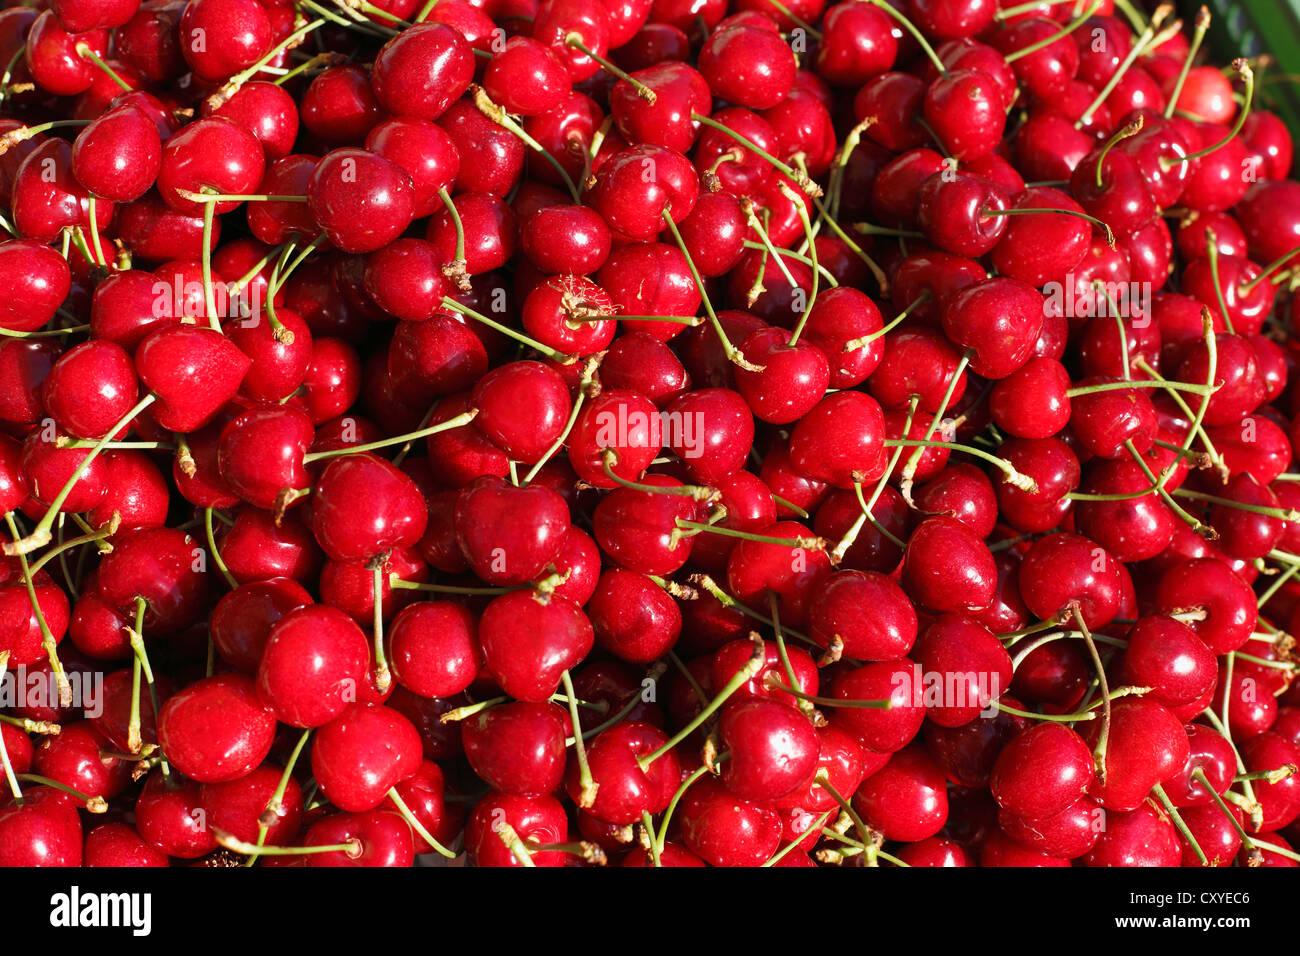 Cherries, Styria, Austria, Europe - Stock Image